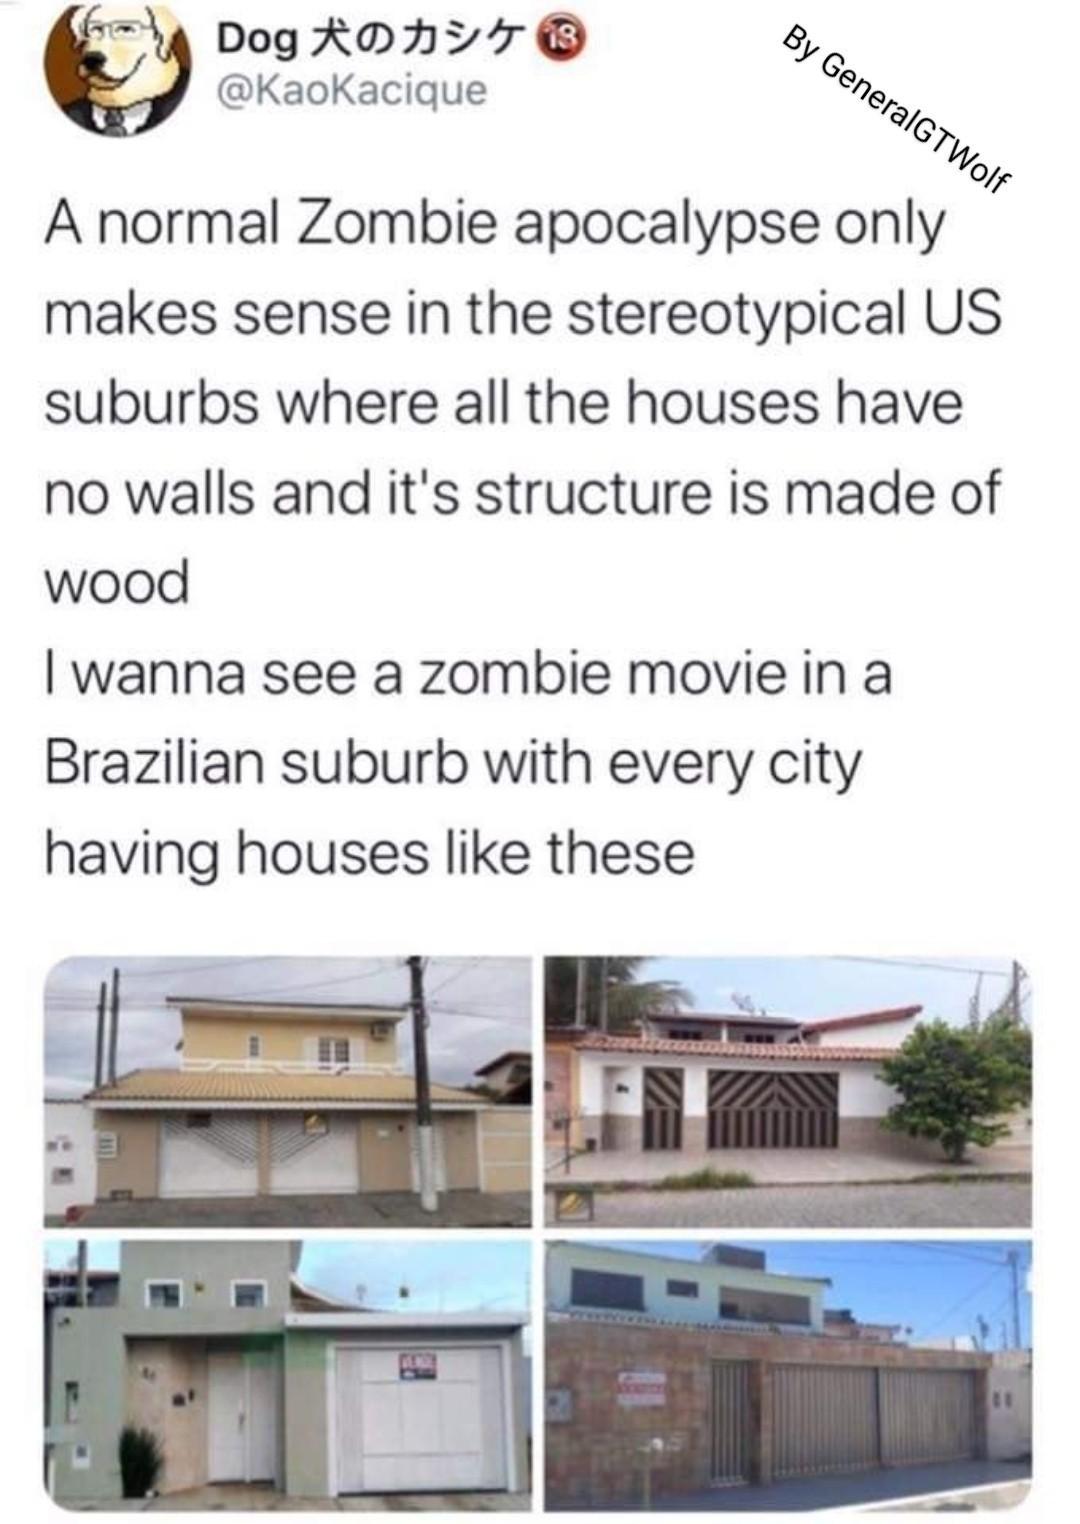 Imagina os zumbi colando lá na favela... - meme